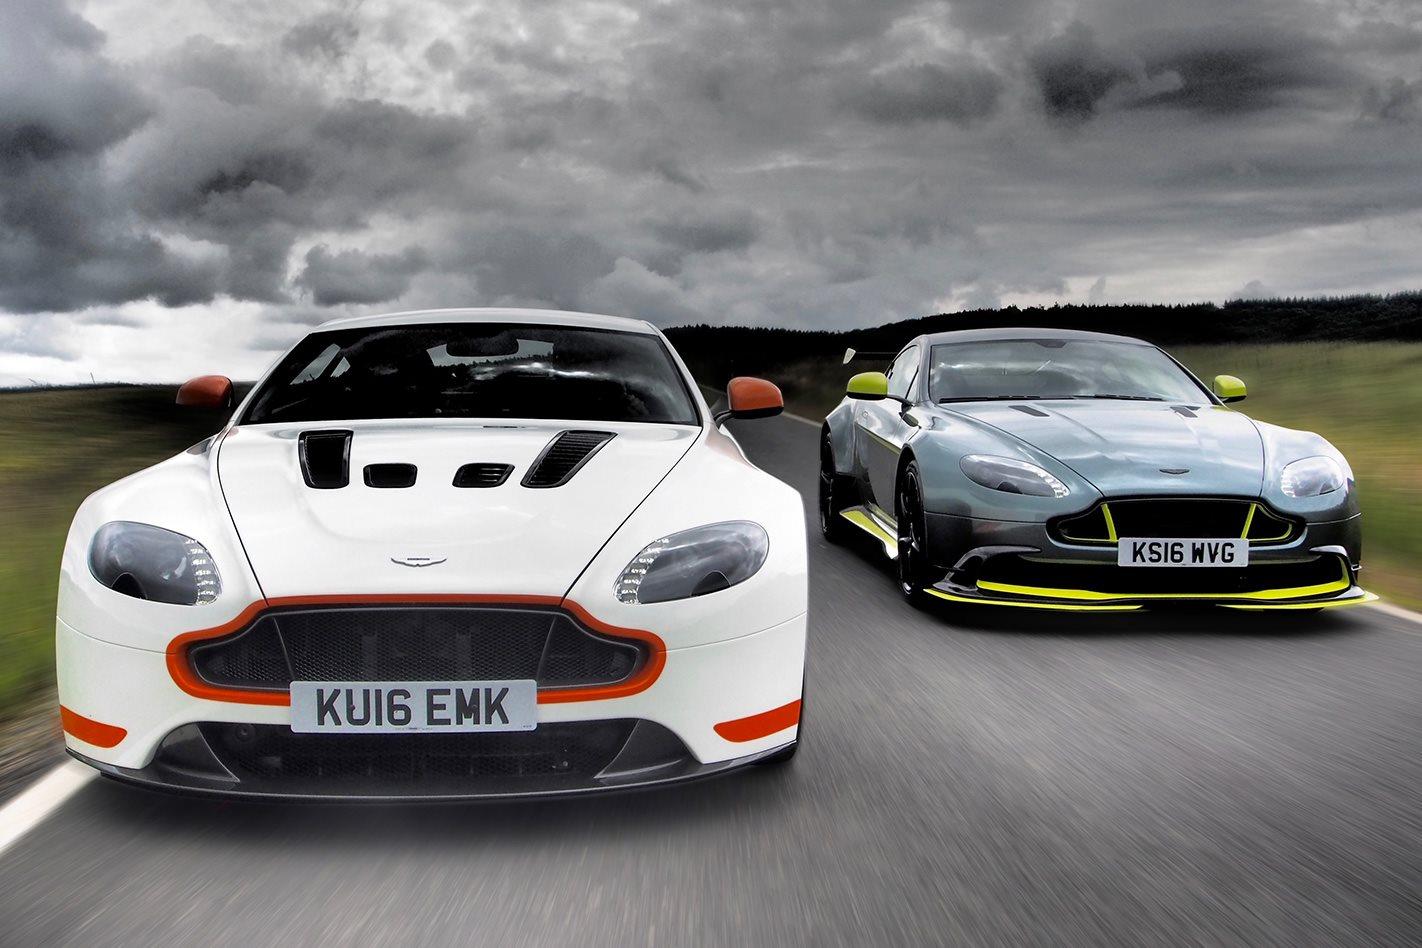 Aston Martin Vantage Gt8 Vs V12 Vantage S